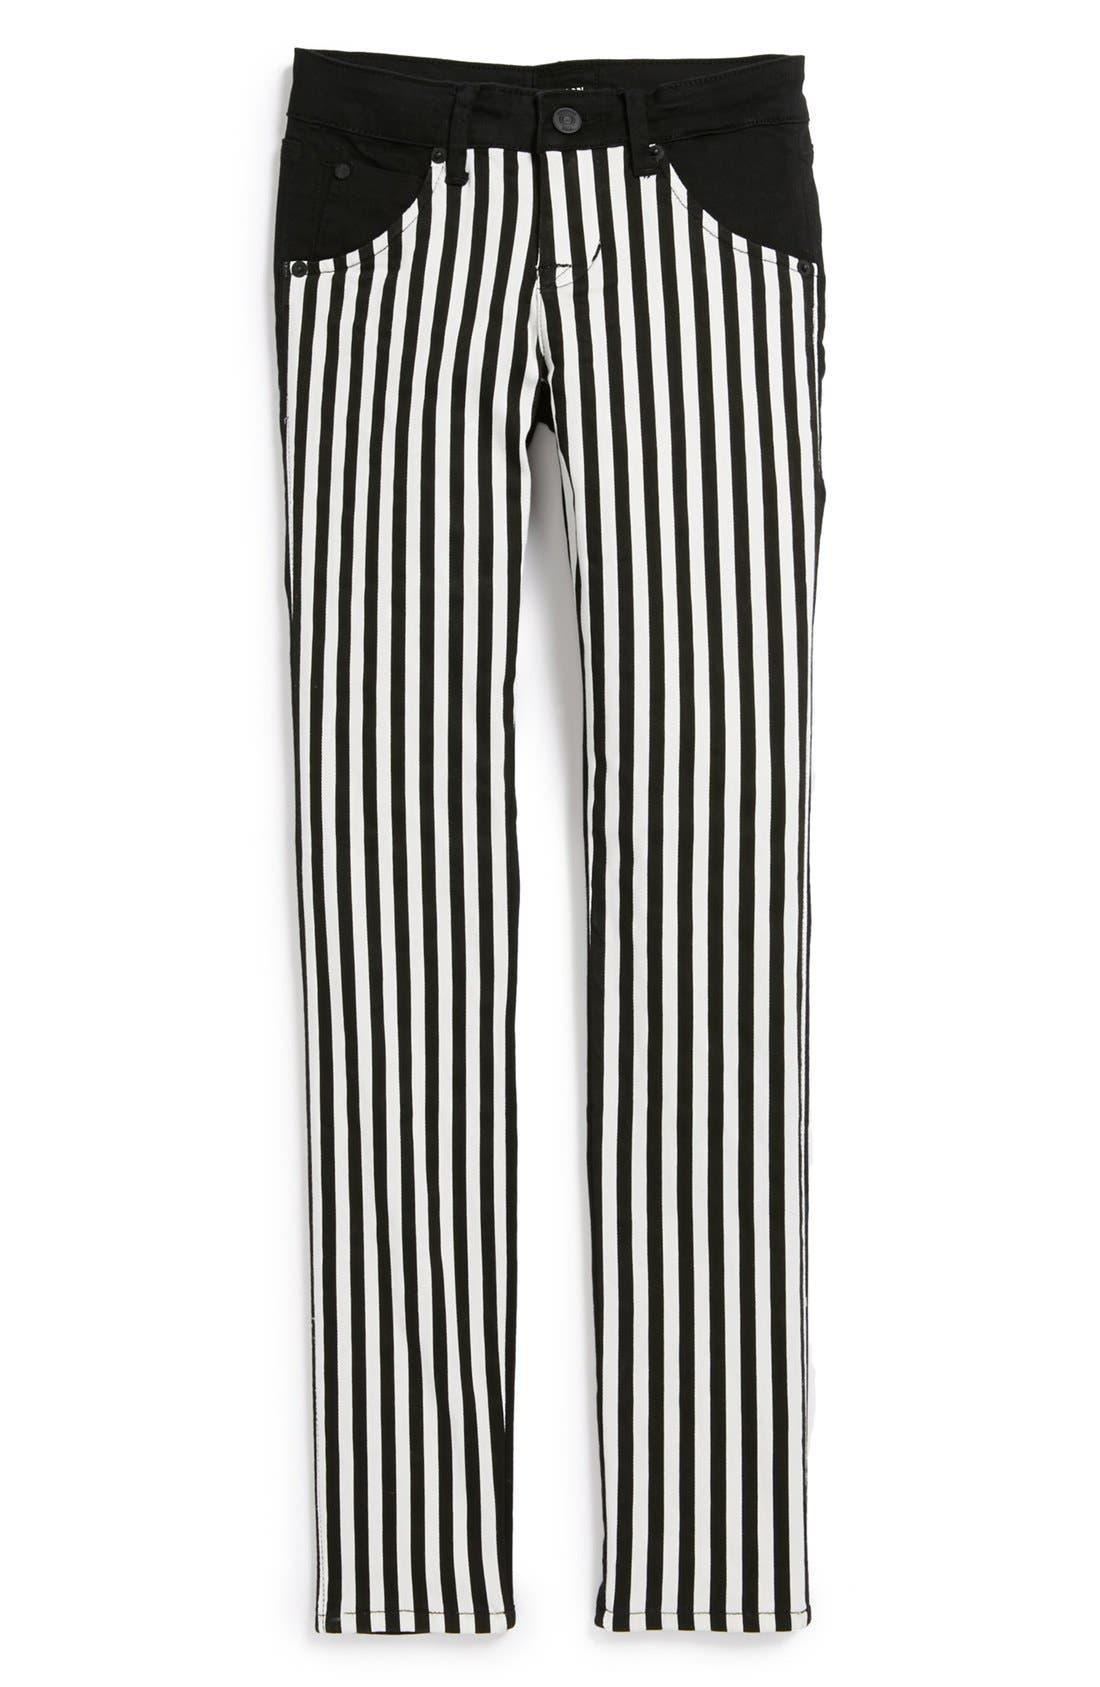 Alternate Image 1 Selected - Hudson Kids 'Collin' Skinny Jeans (Vice Versa) (Big Girls)